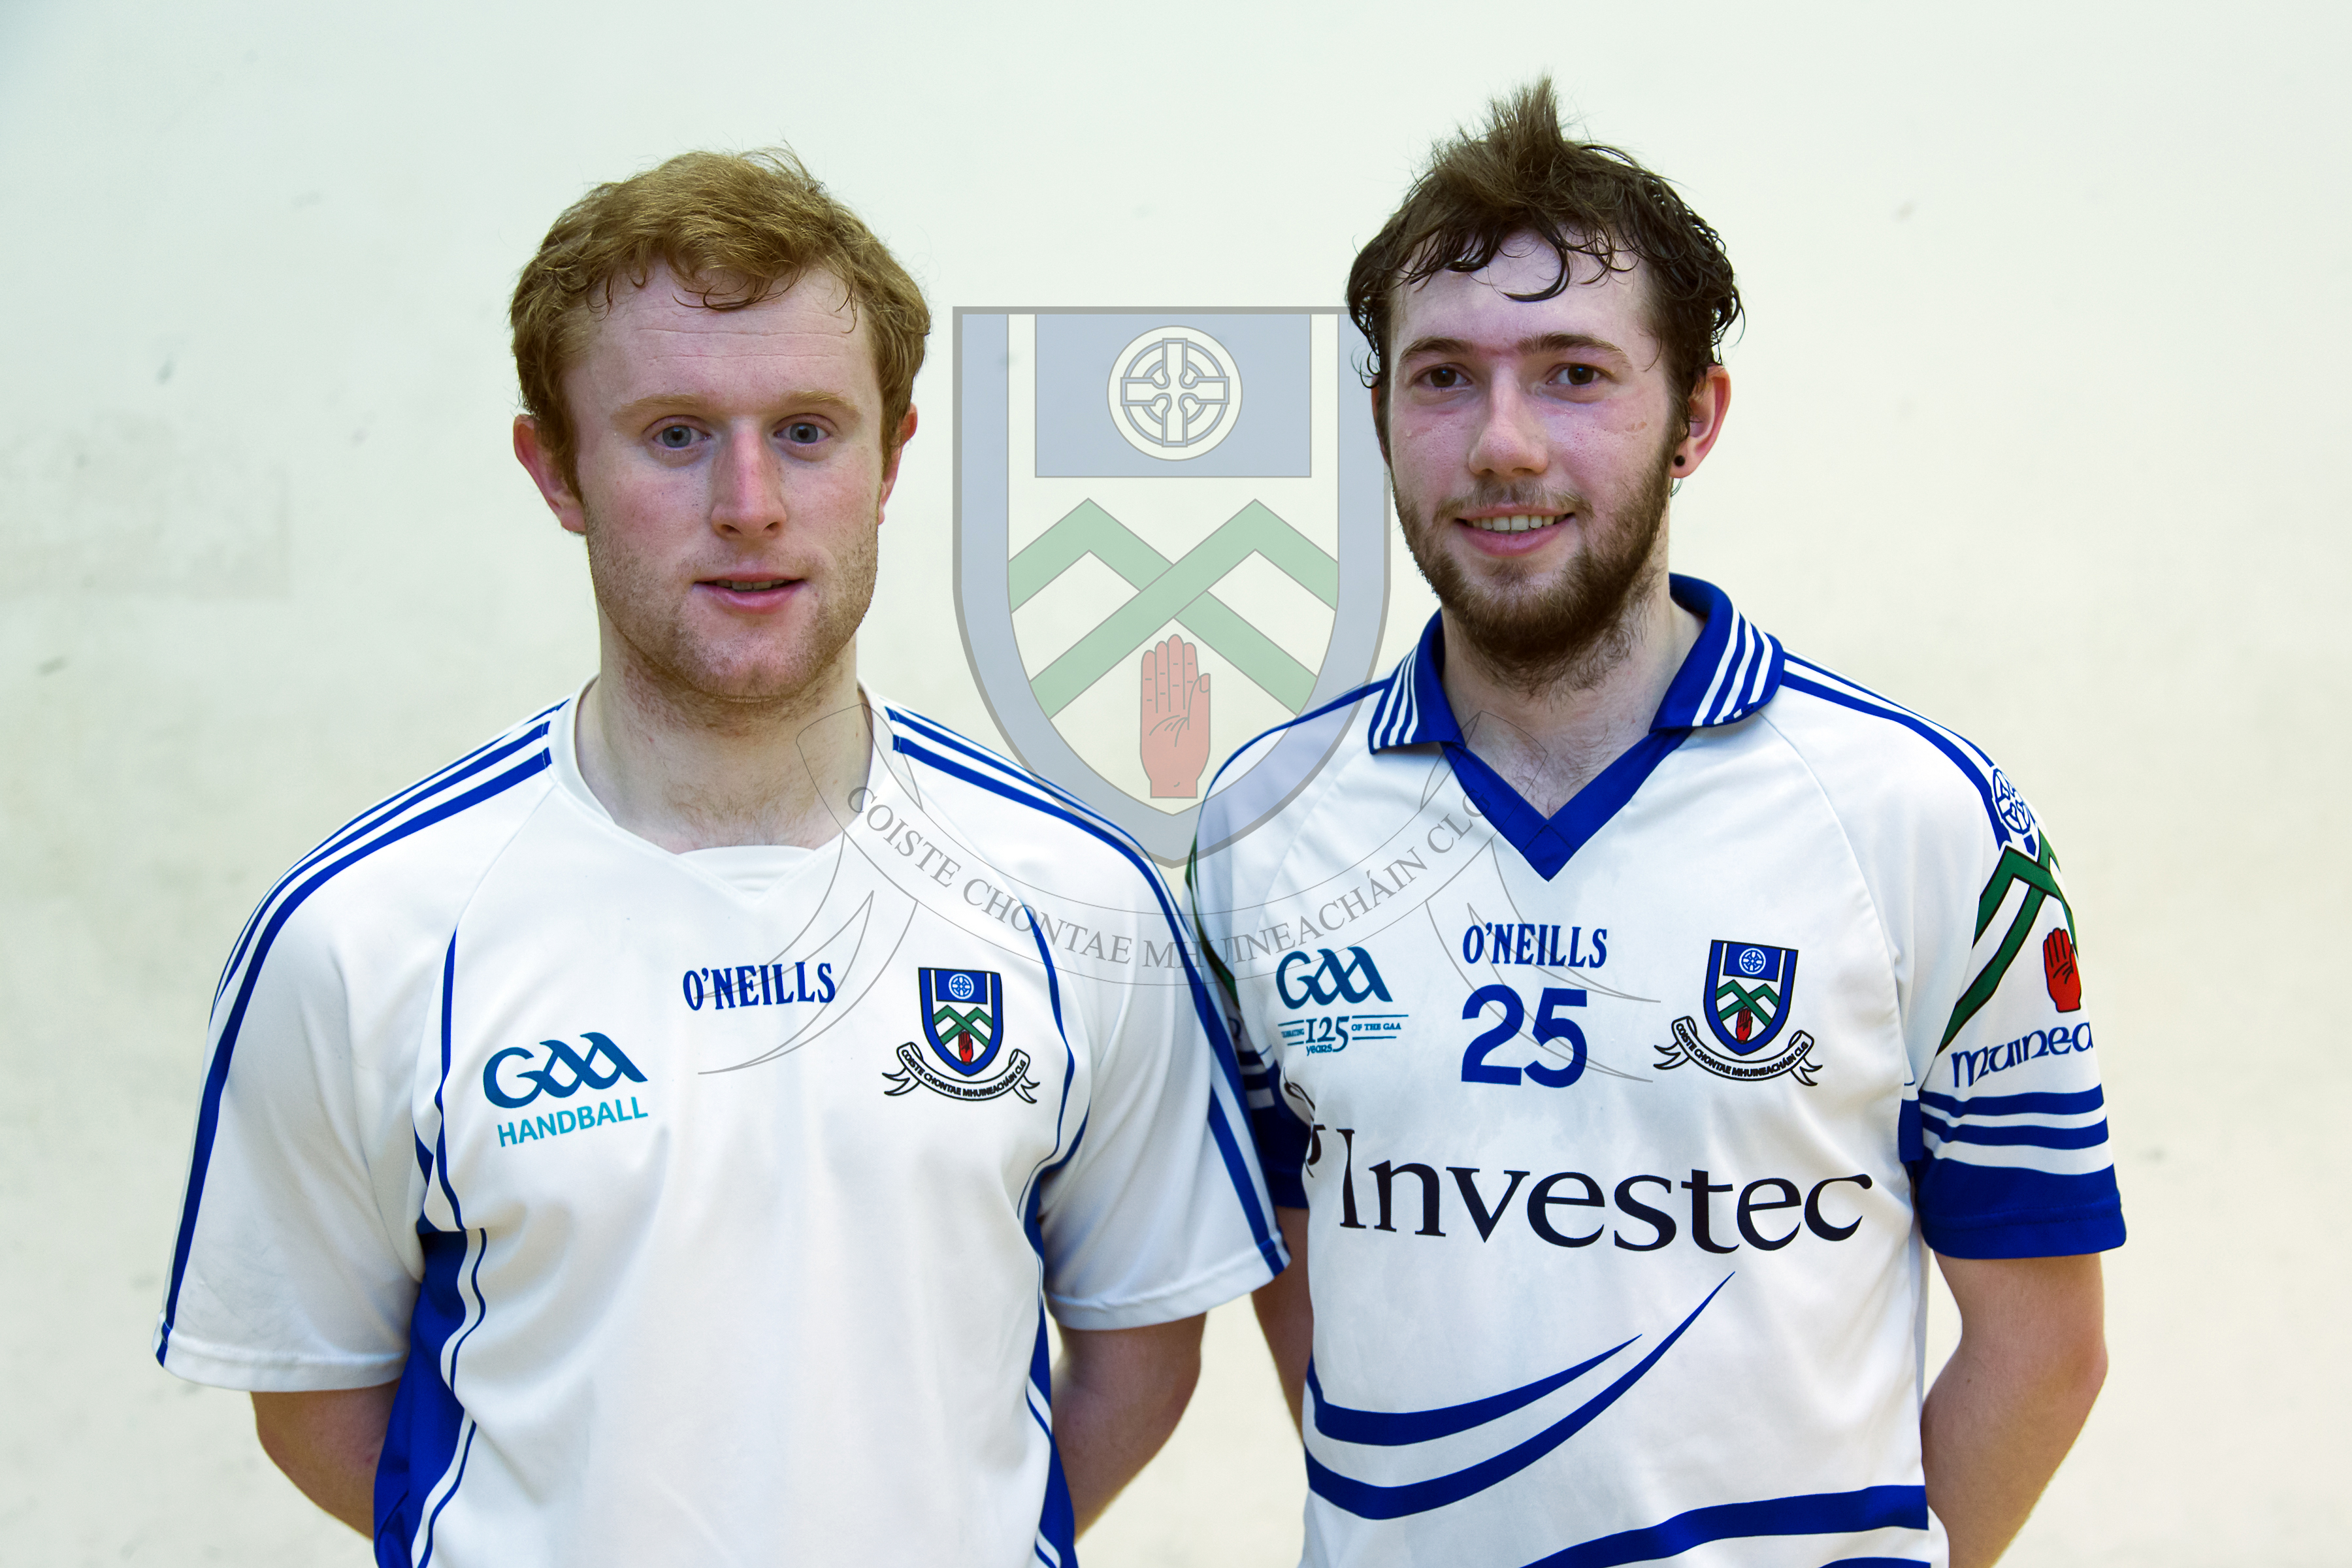 Ulster Handball Success for Monaghan Star Duo